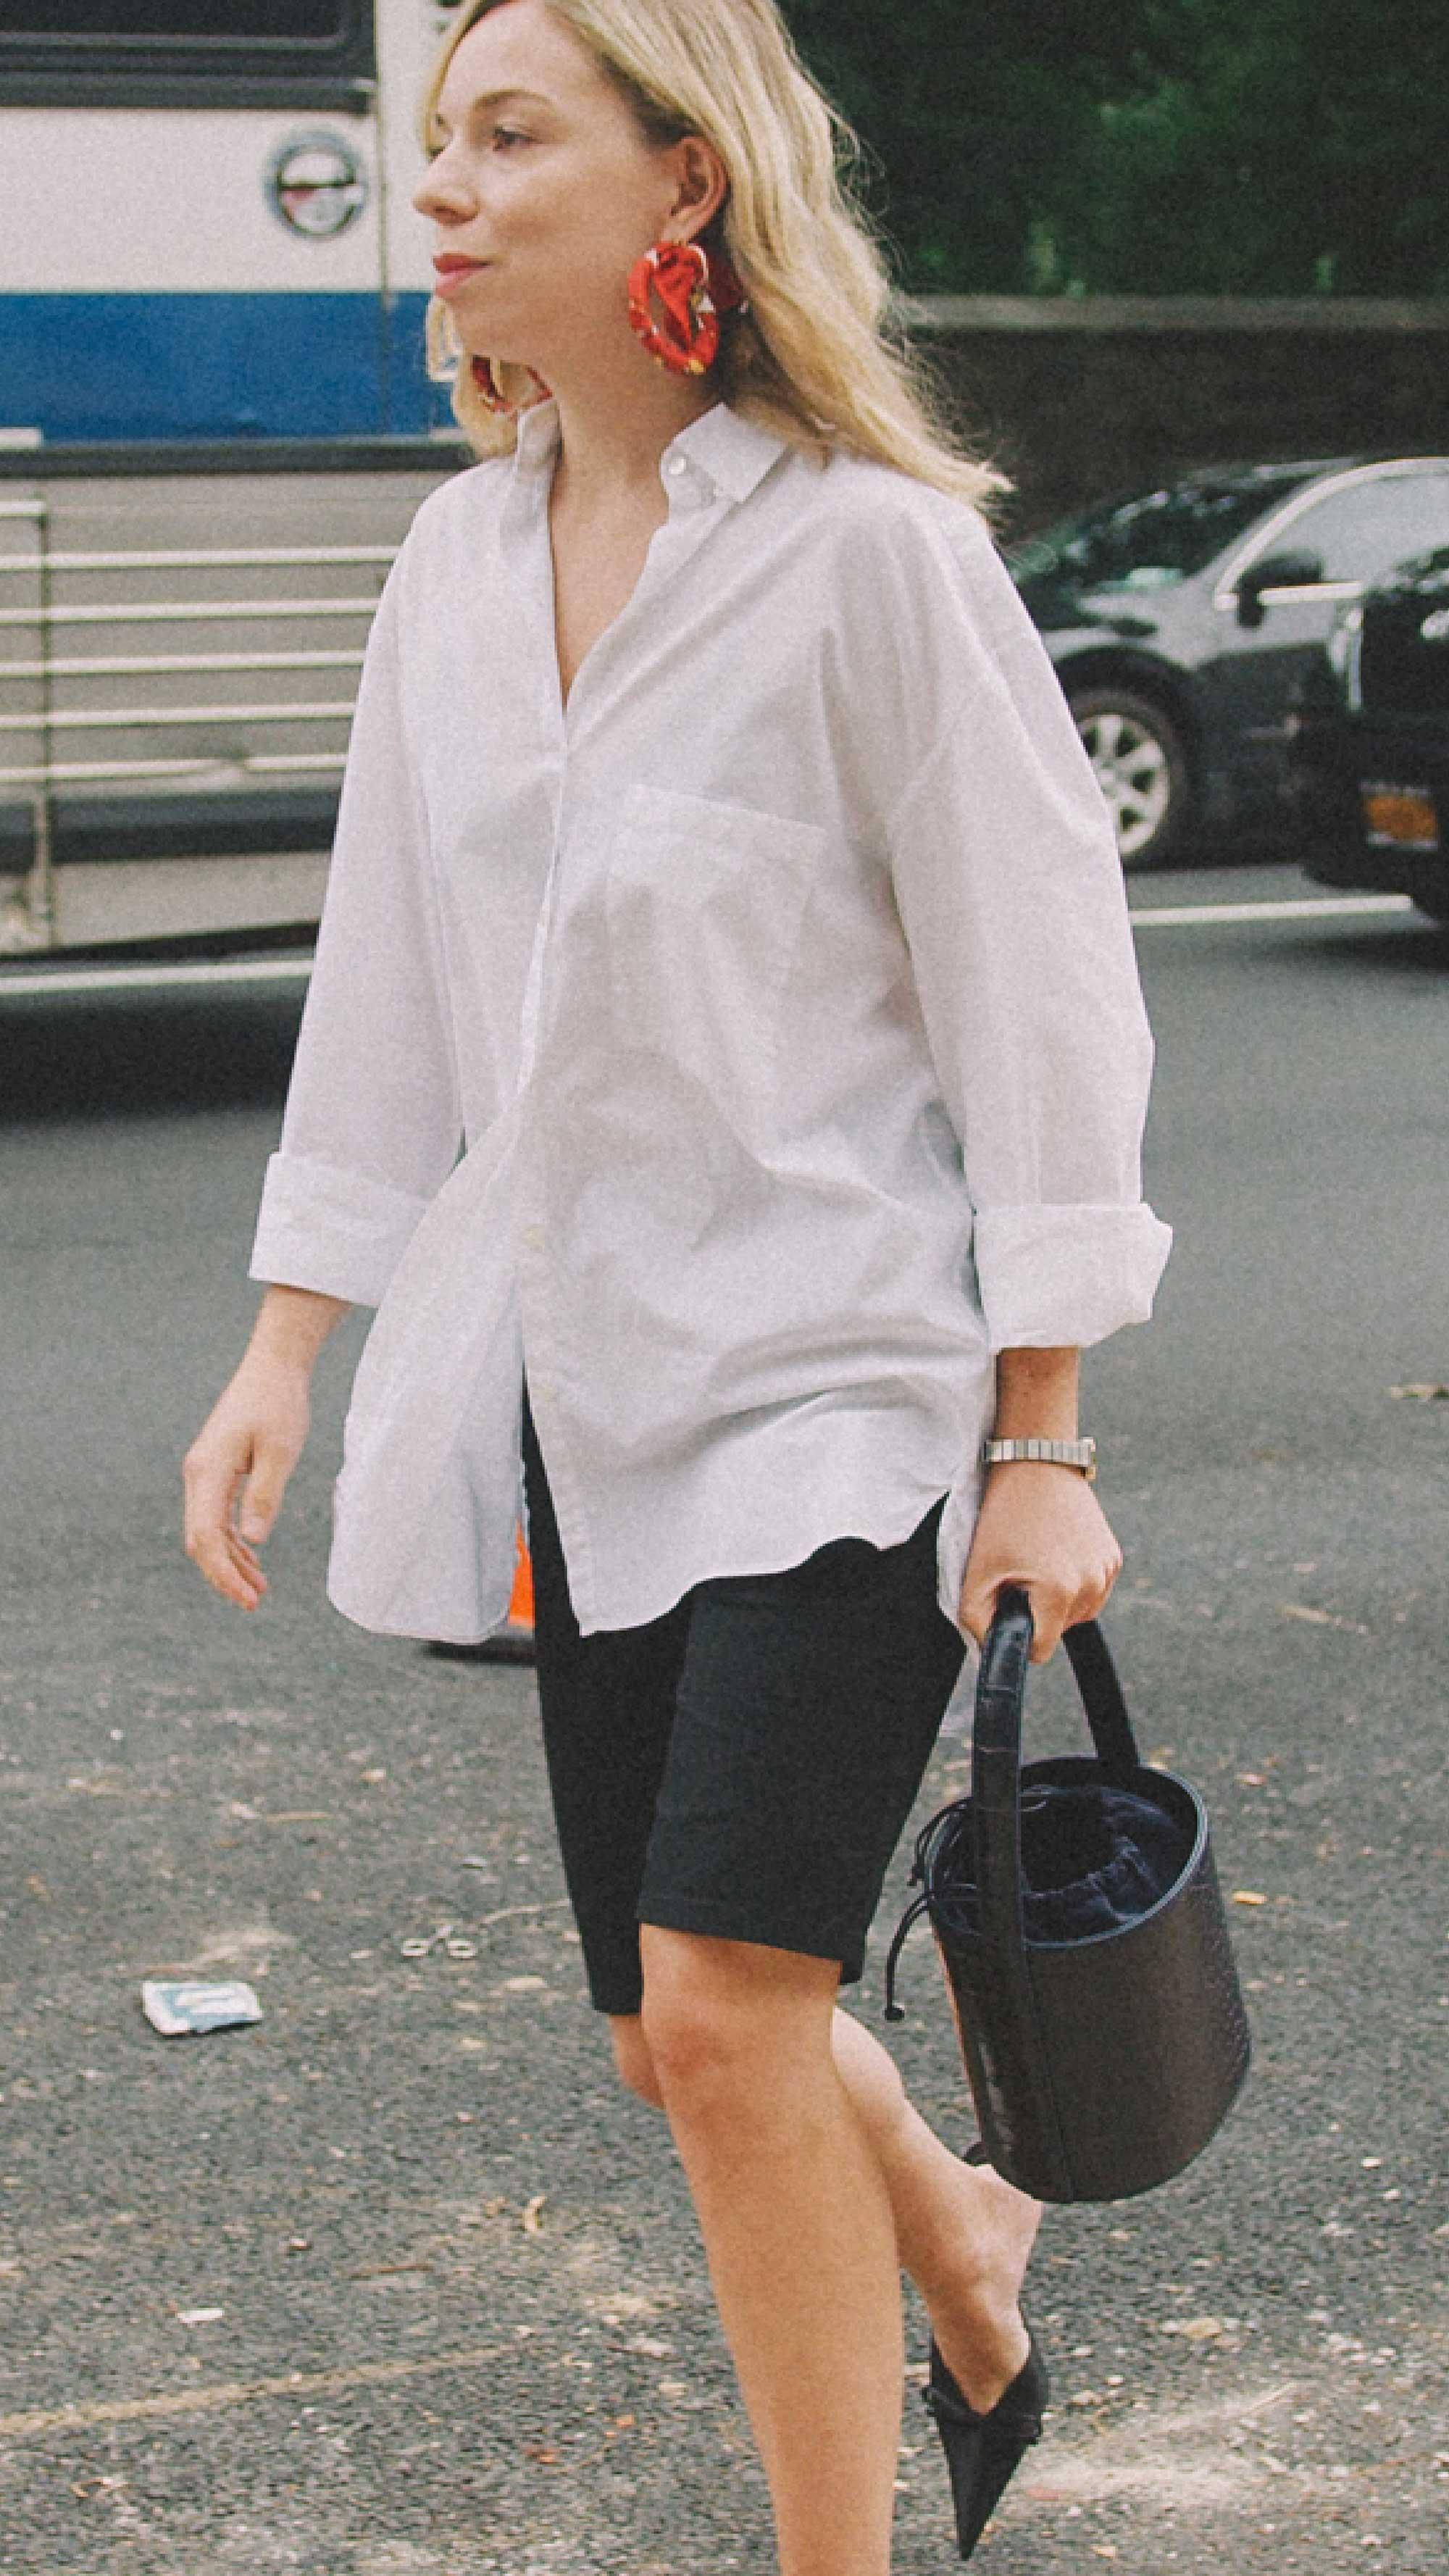 New-York-Fashion-Week-NYFW-SS18-street-style-day-two-SS18.jpg2.jpg